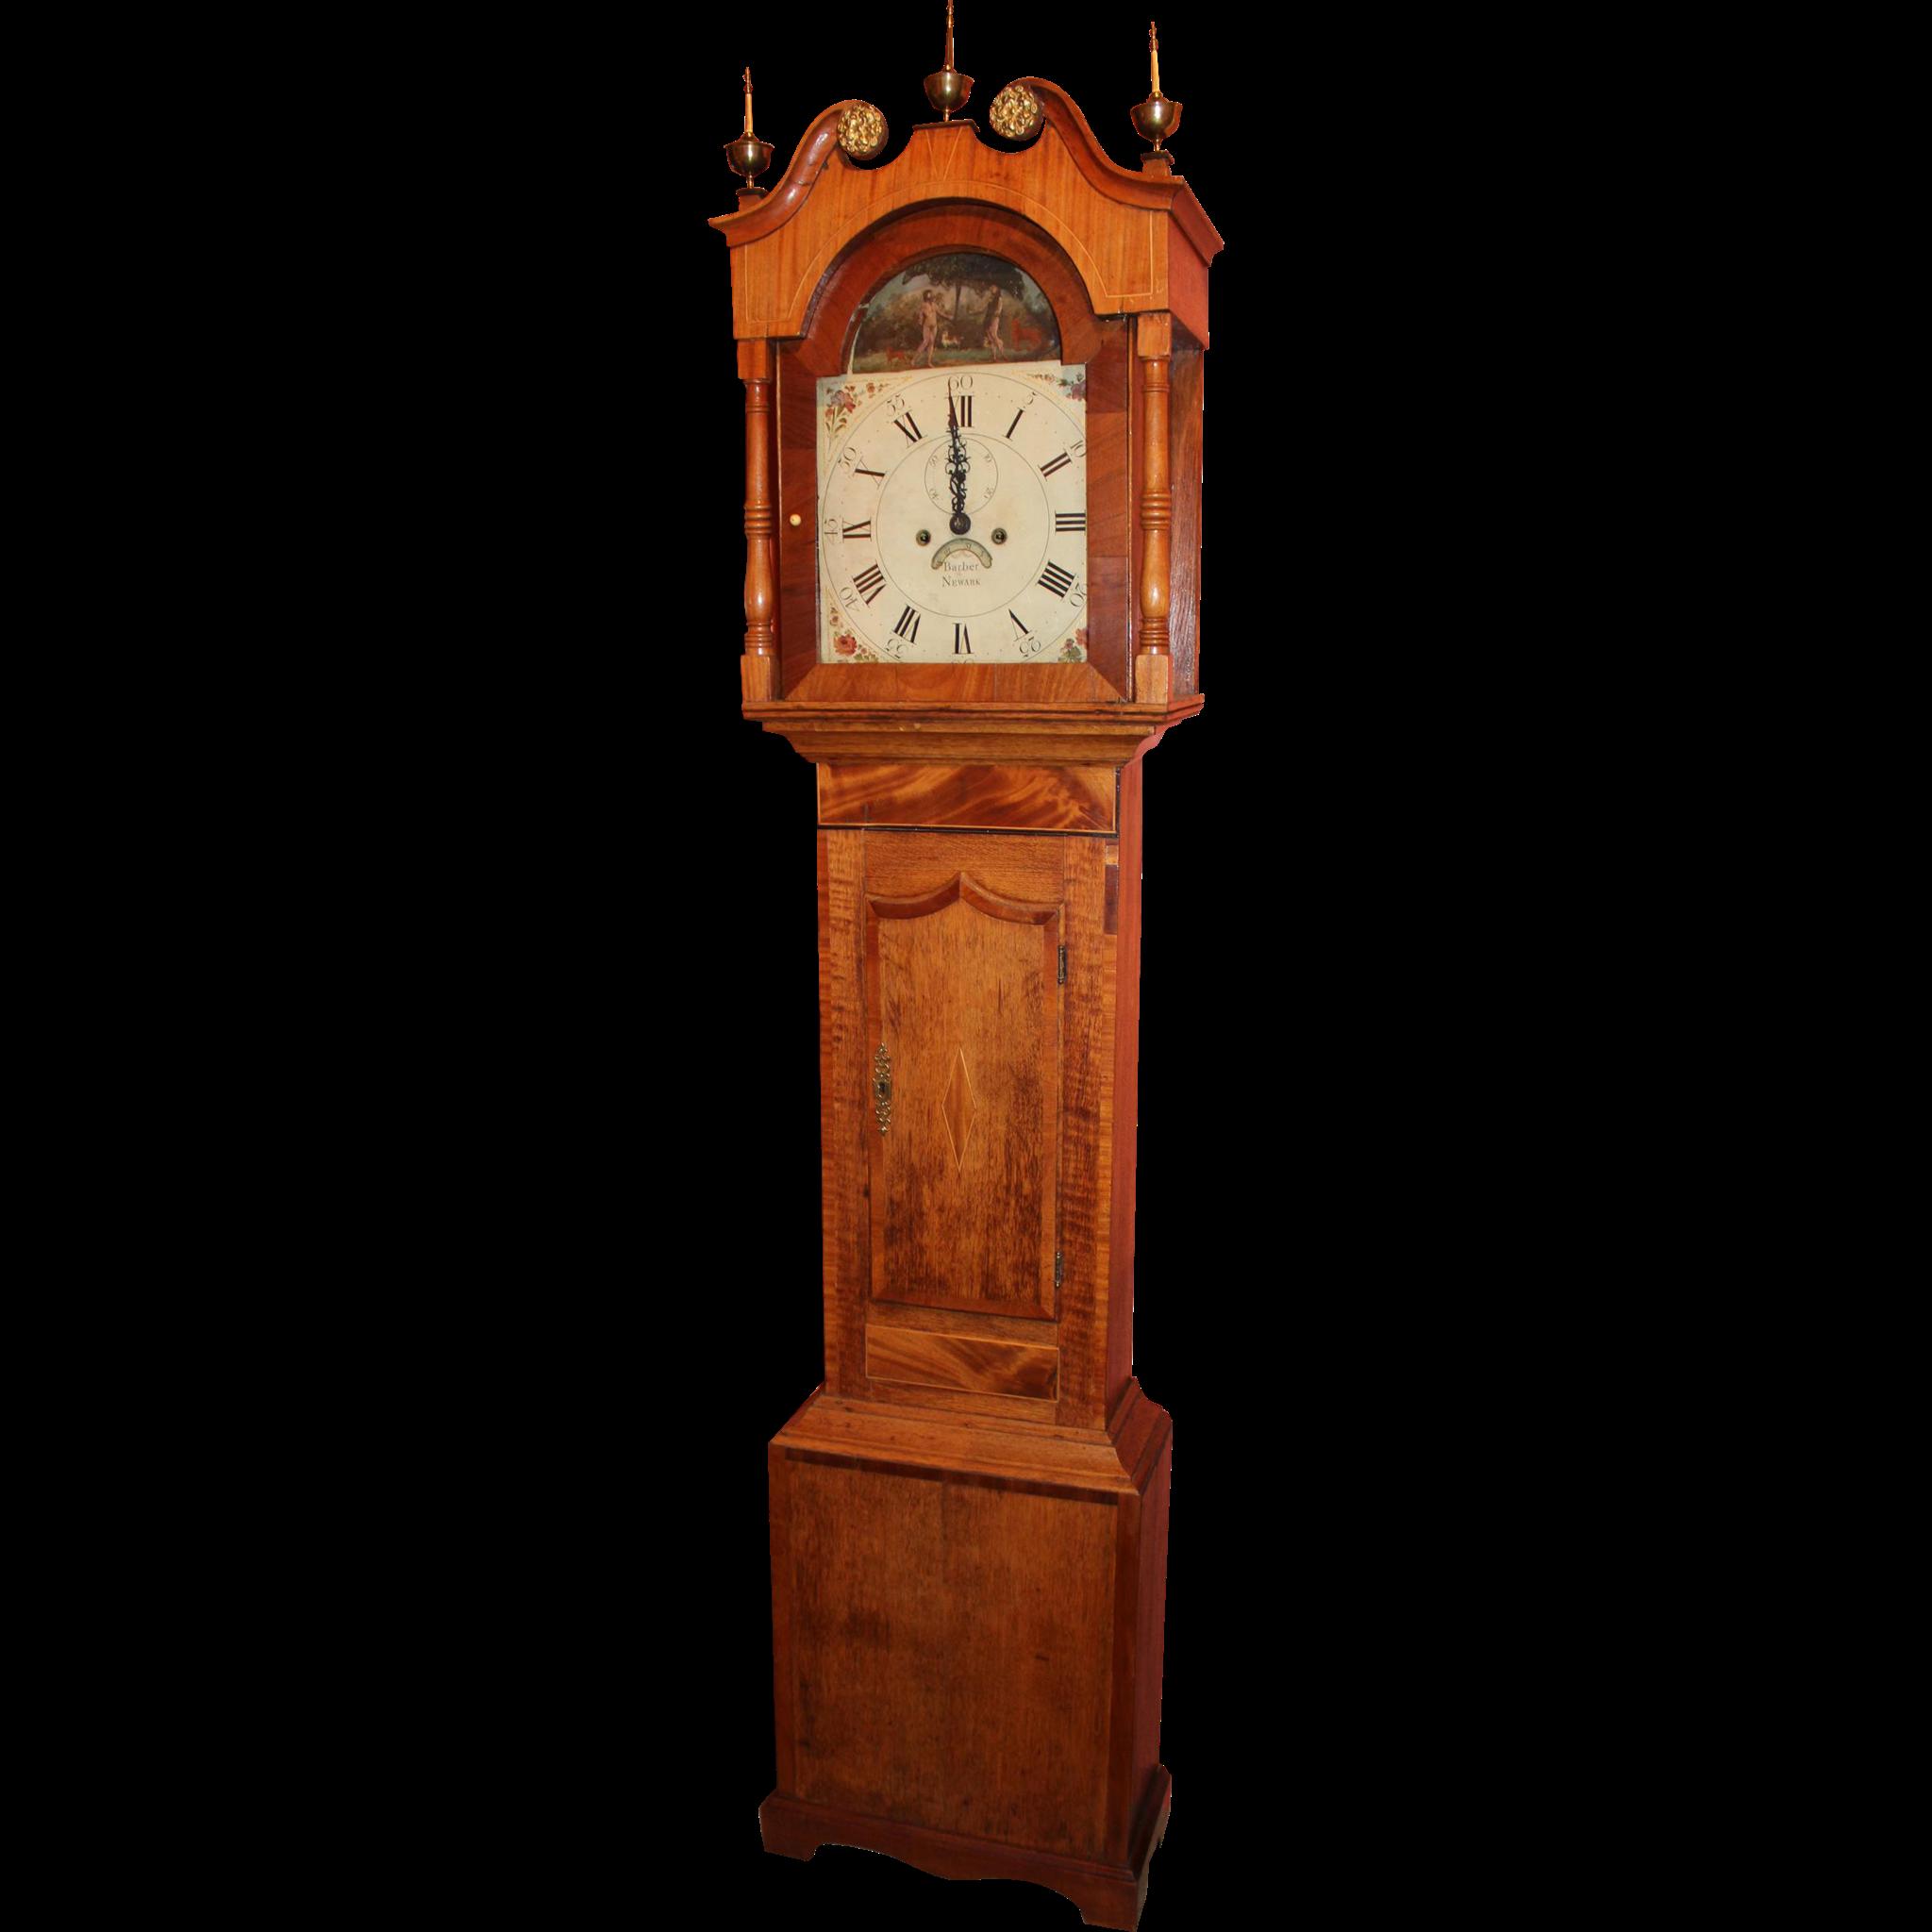 18th c English Tall Case Clock with Rare Automaton Adam & Eve Movement